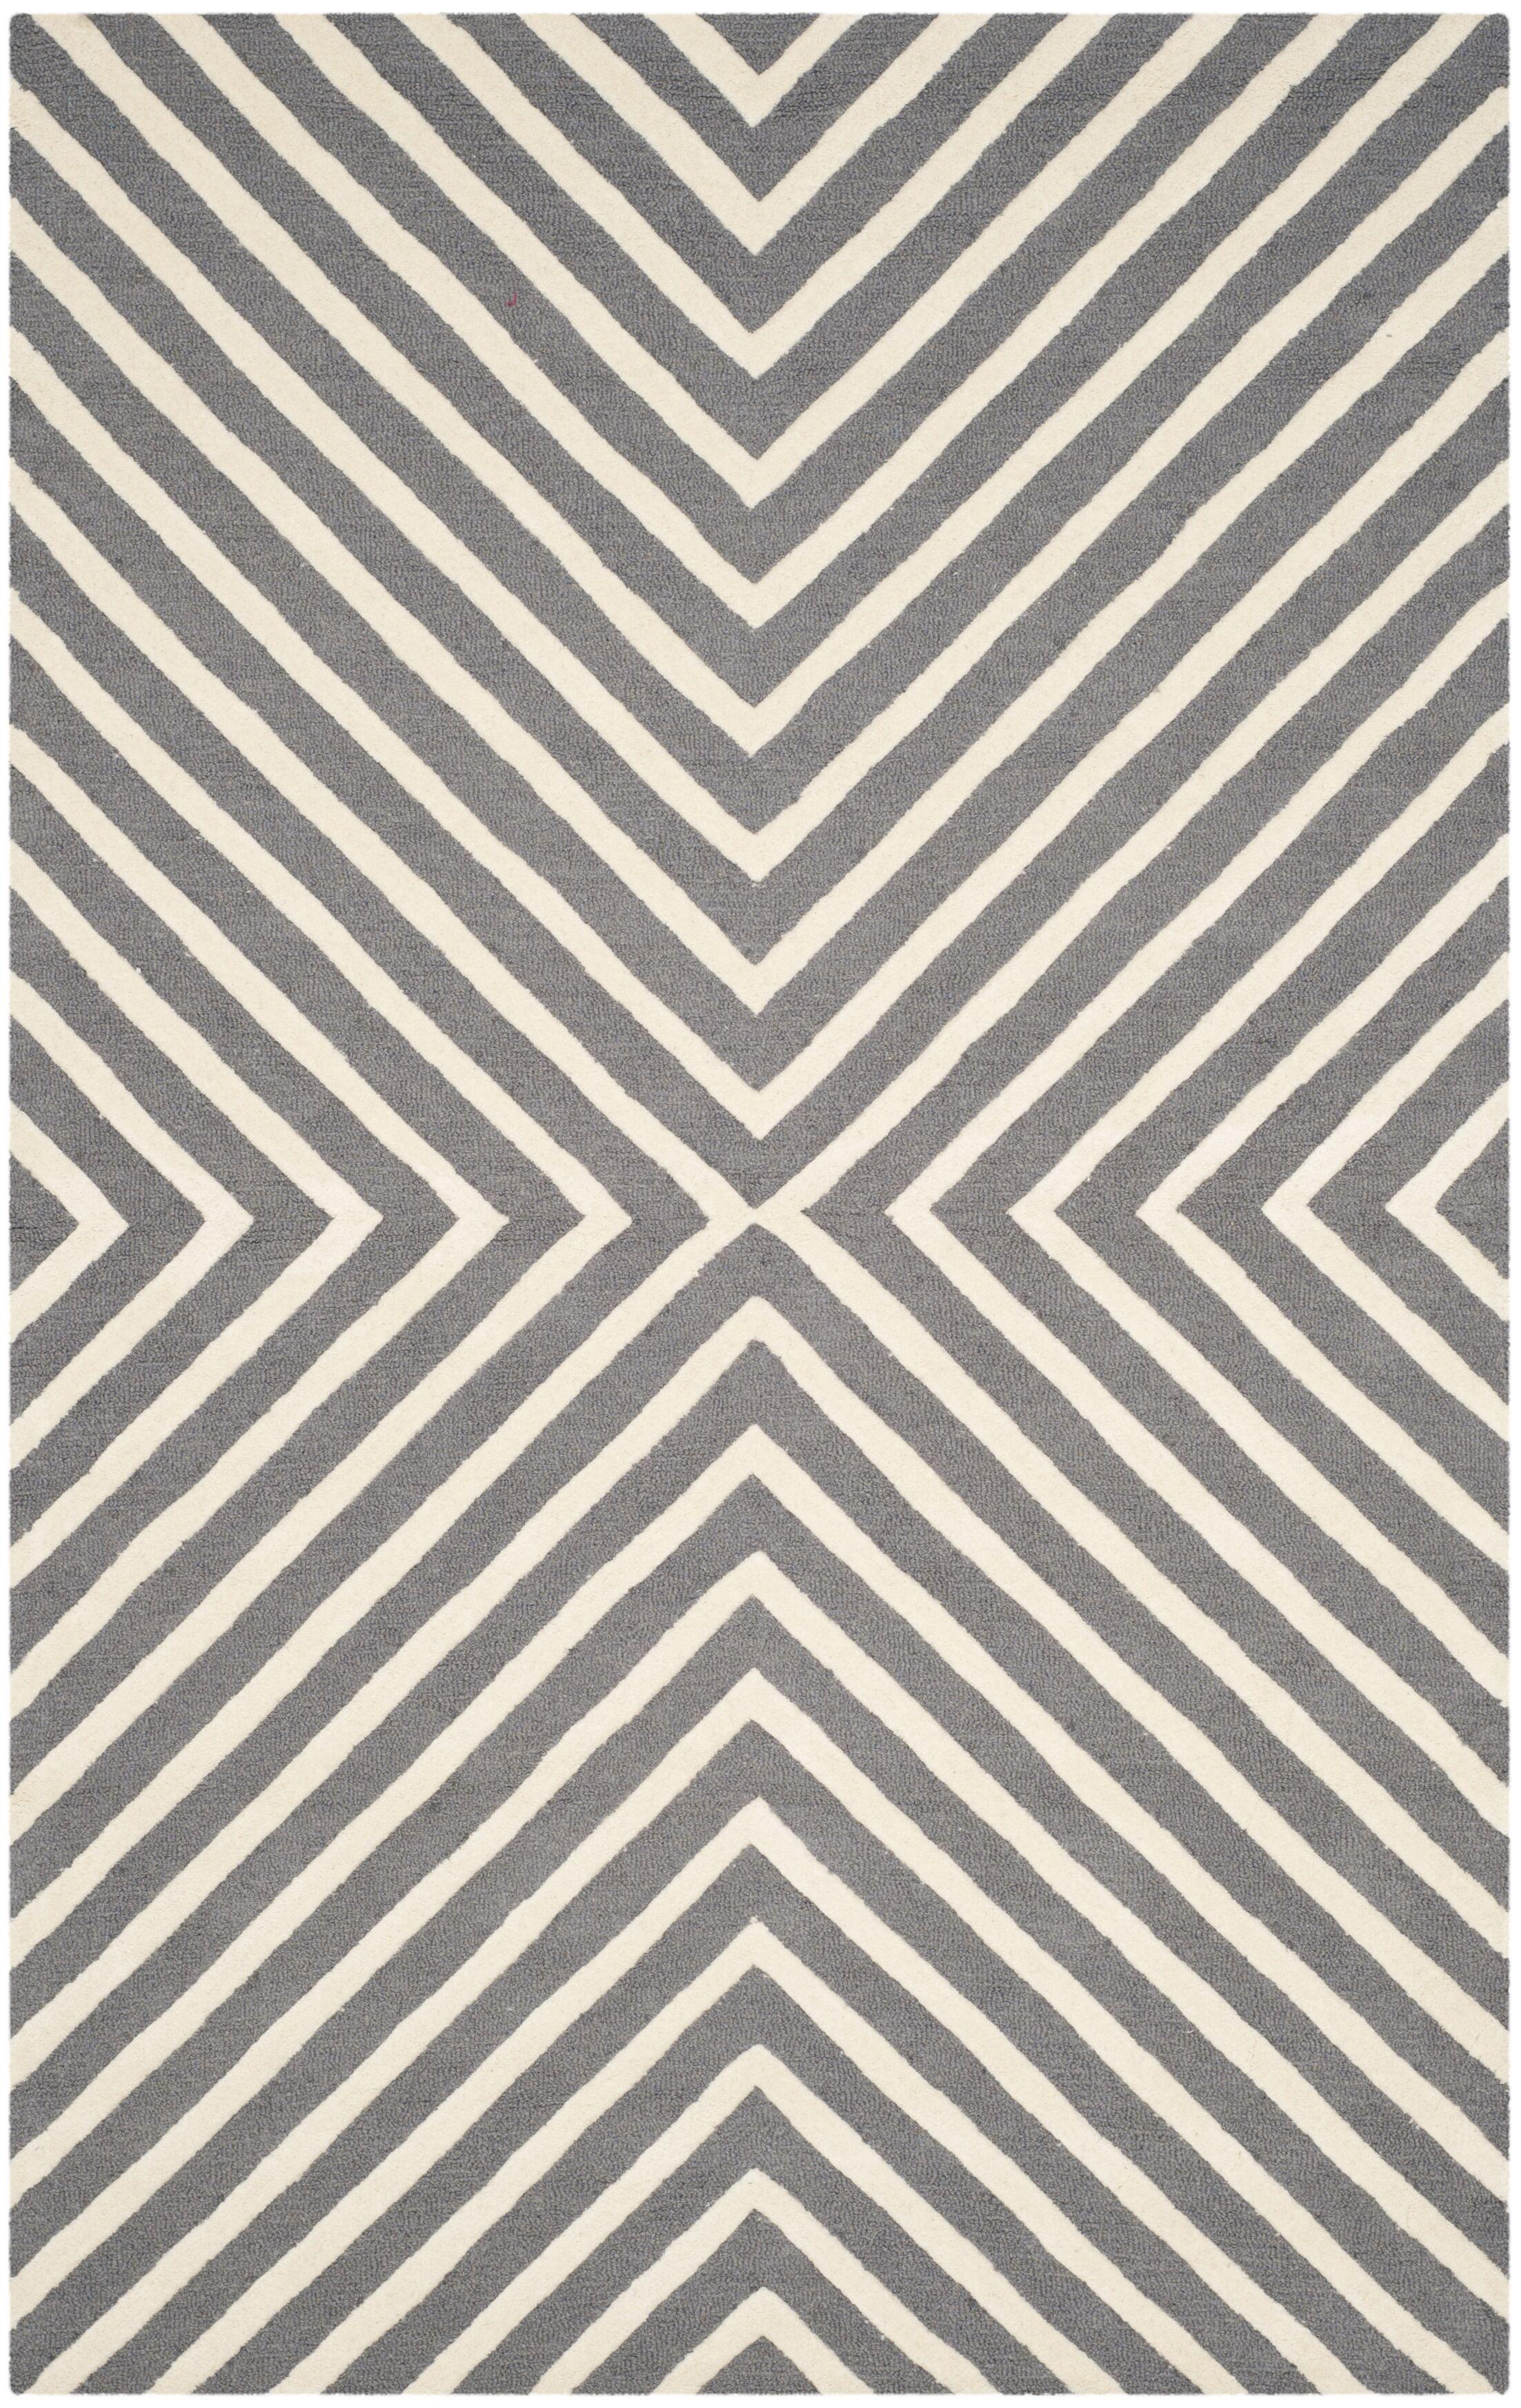 Oakley Dark Gray/Ivory Area Rug Rug Size: Rectangle 5' x 8'